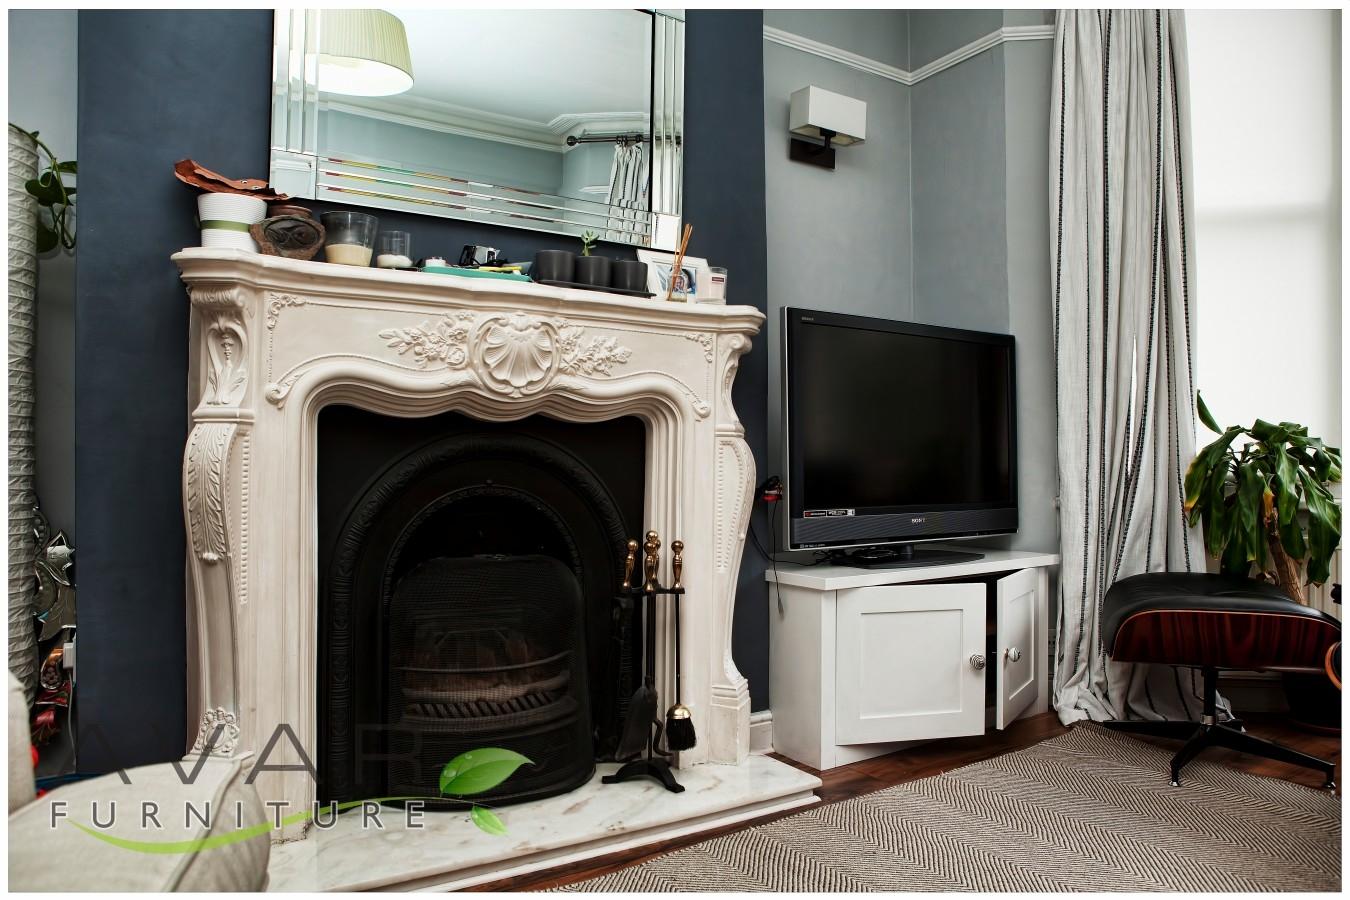 Alcove Units Ideas Gallery 7 North London Uk Avar Furniture Regarding Bespoke Tv Cabinet (Image 1 of 15)